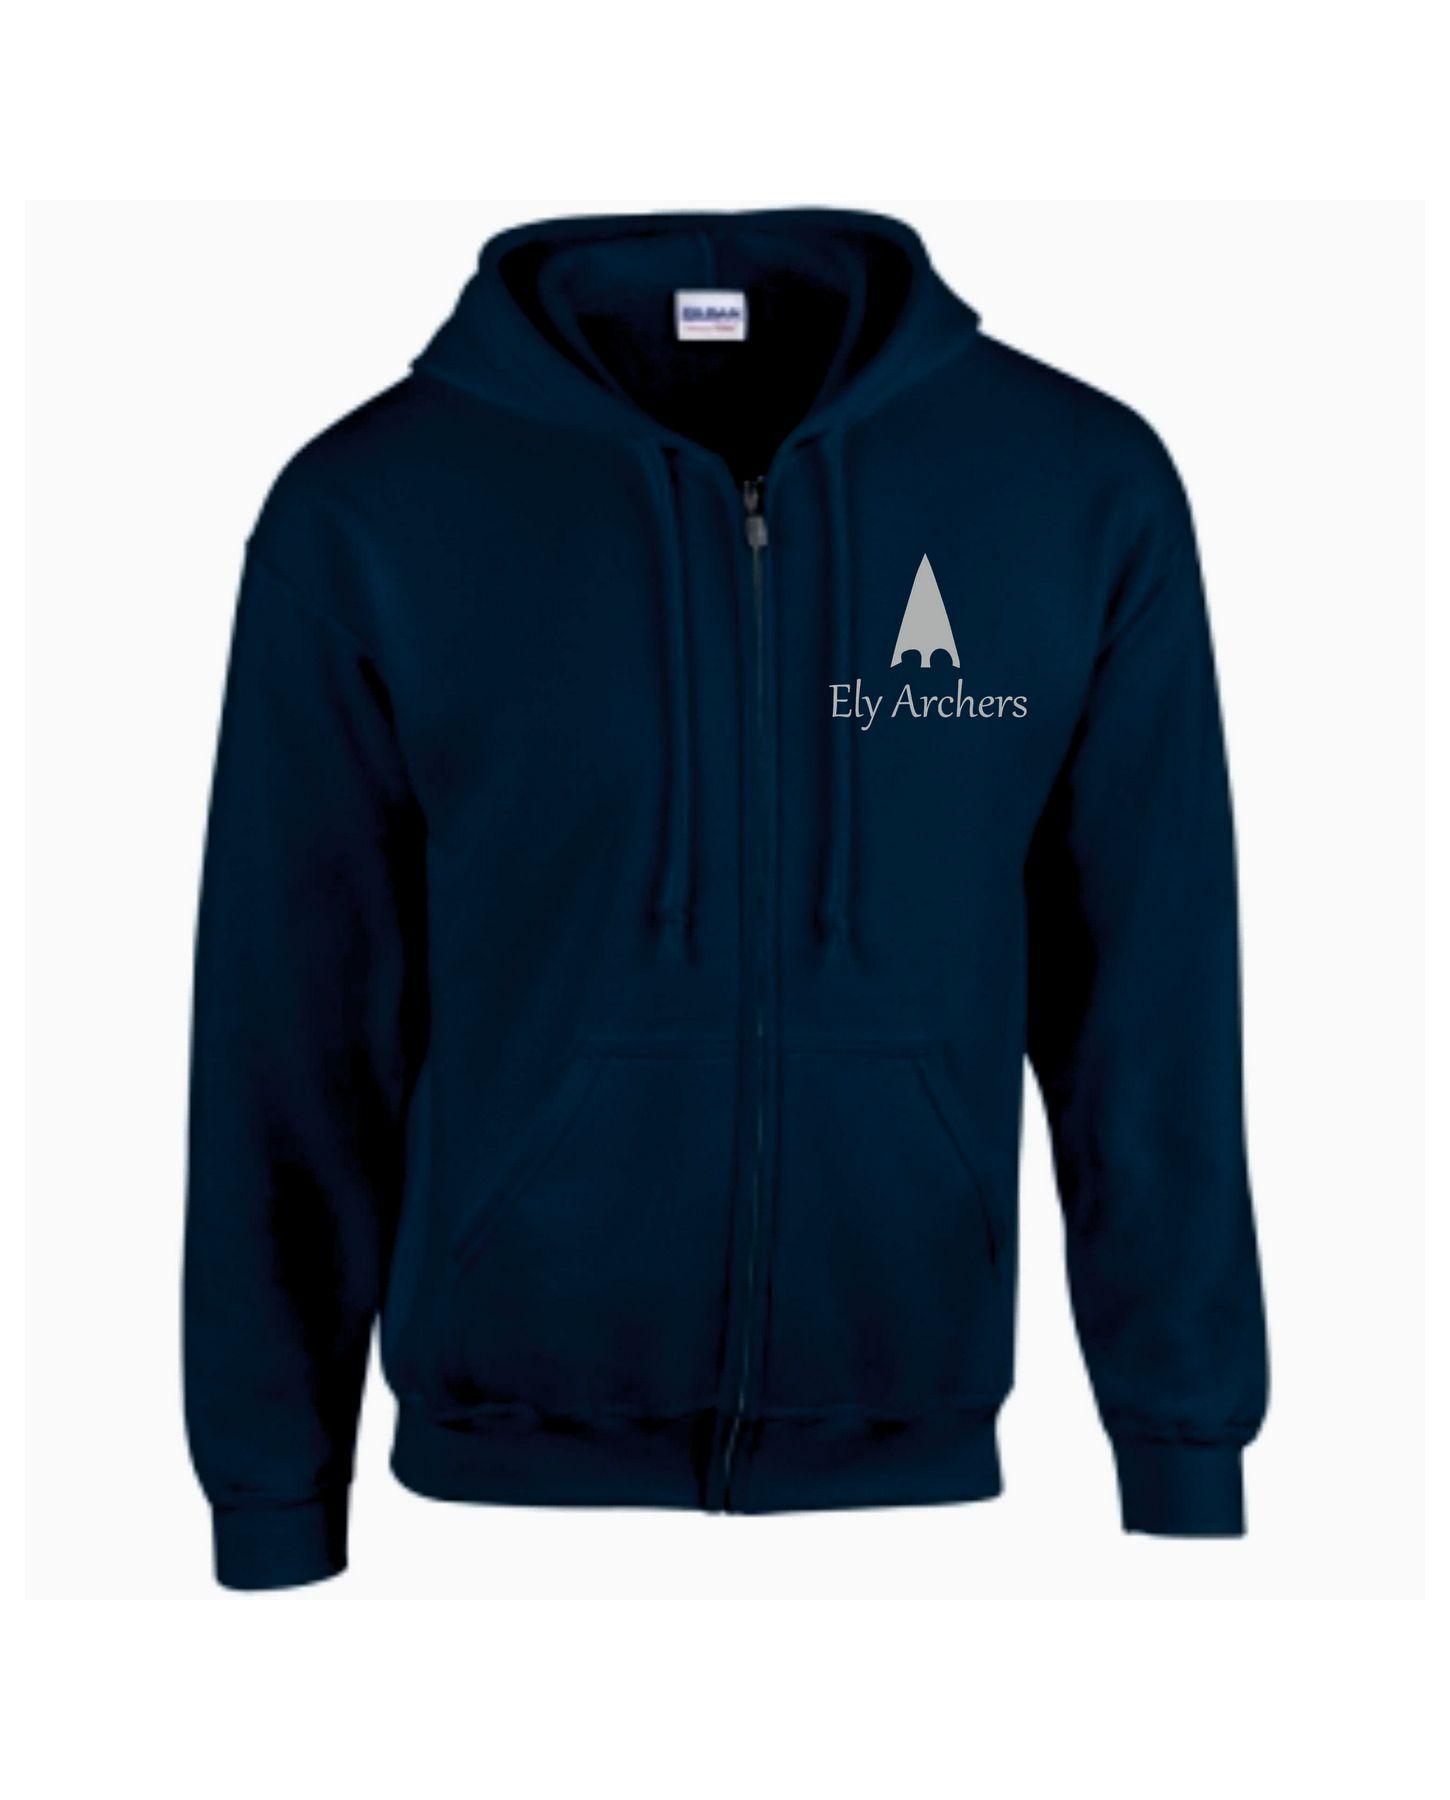 Ely Archers Unisex Zip Up Hooded Sweatshirt